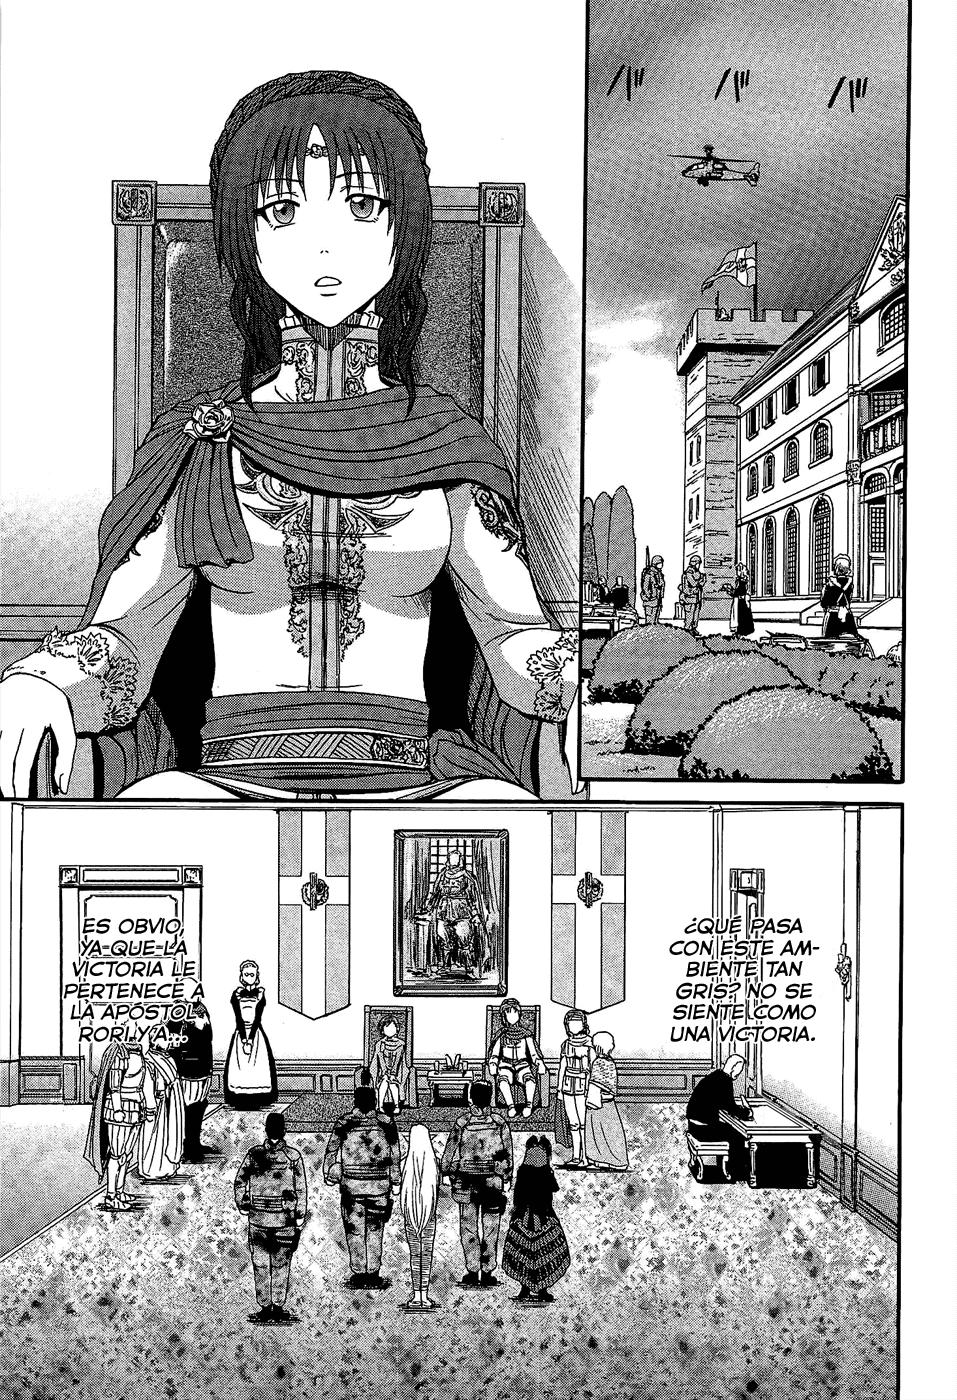 https://c5.ninemanga.com/es_manga/59/187/351085/e6cbc650cd5798a05dfd0f51d14cde5c.jpg Page 6